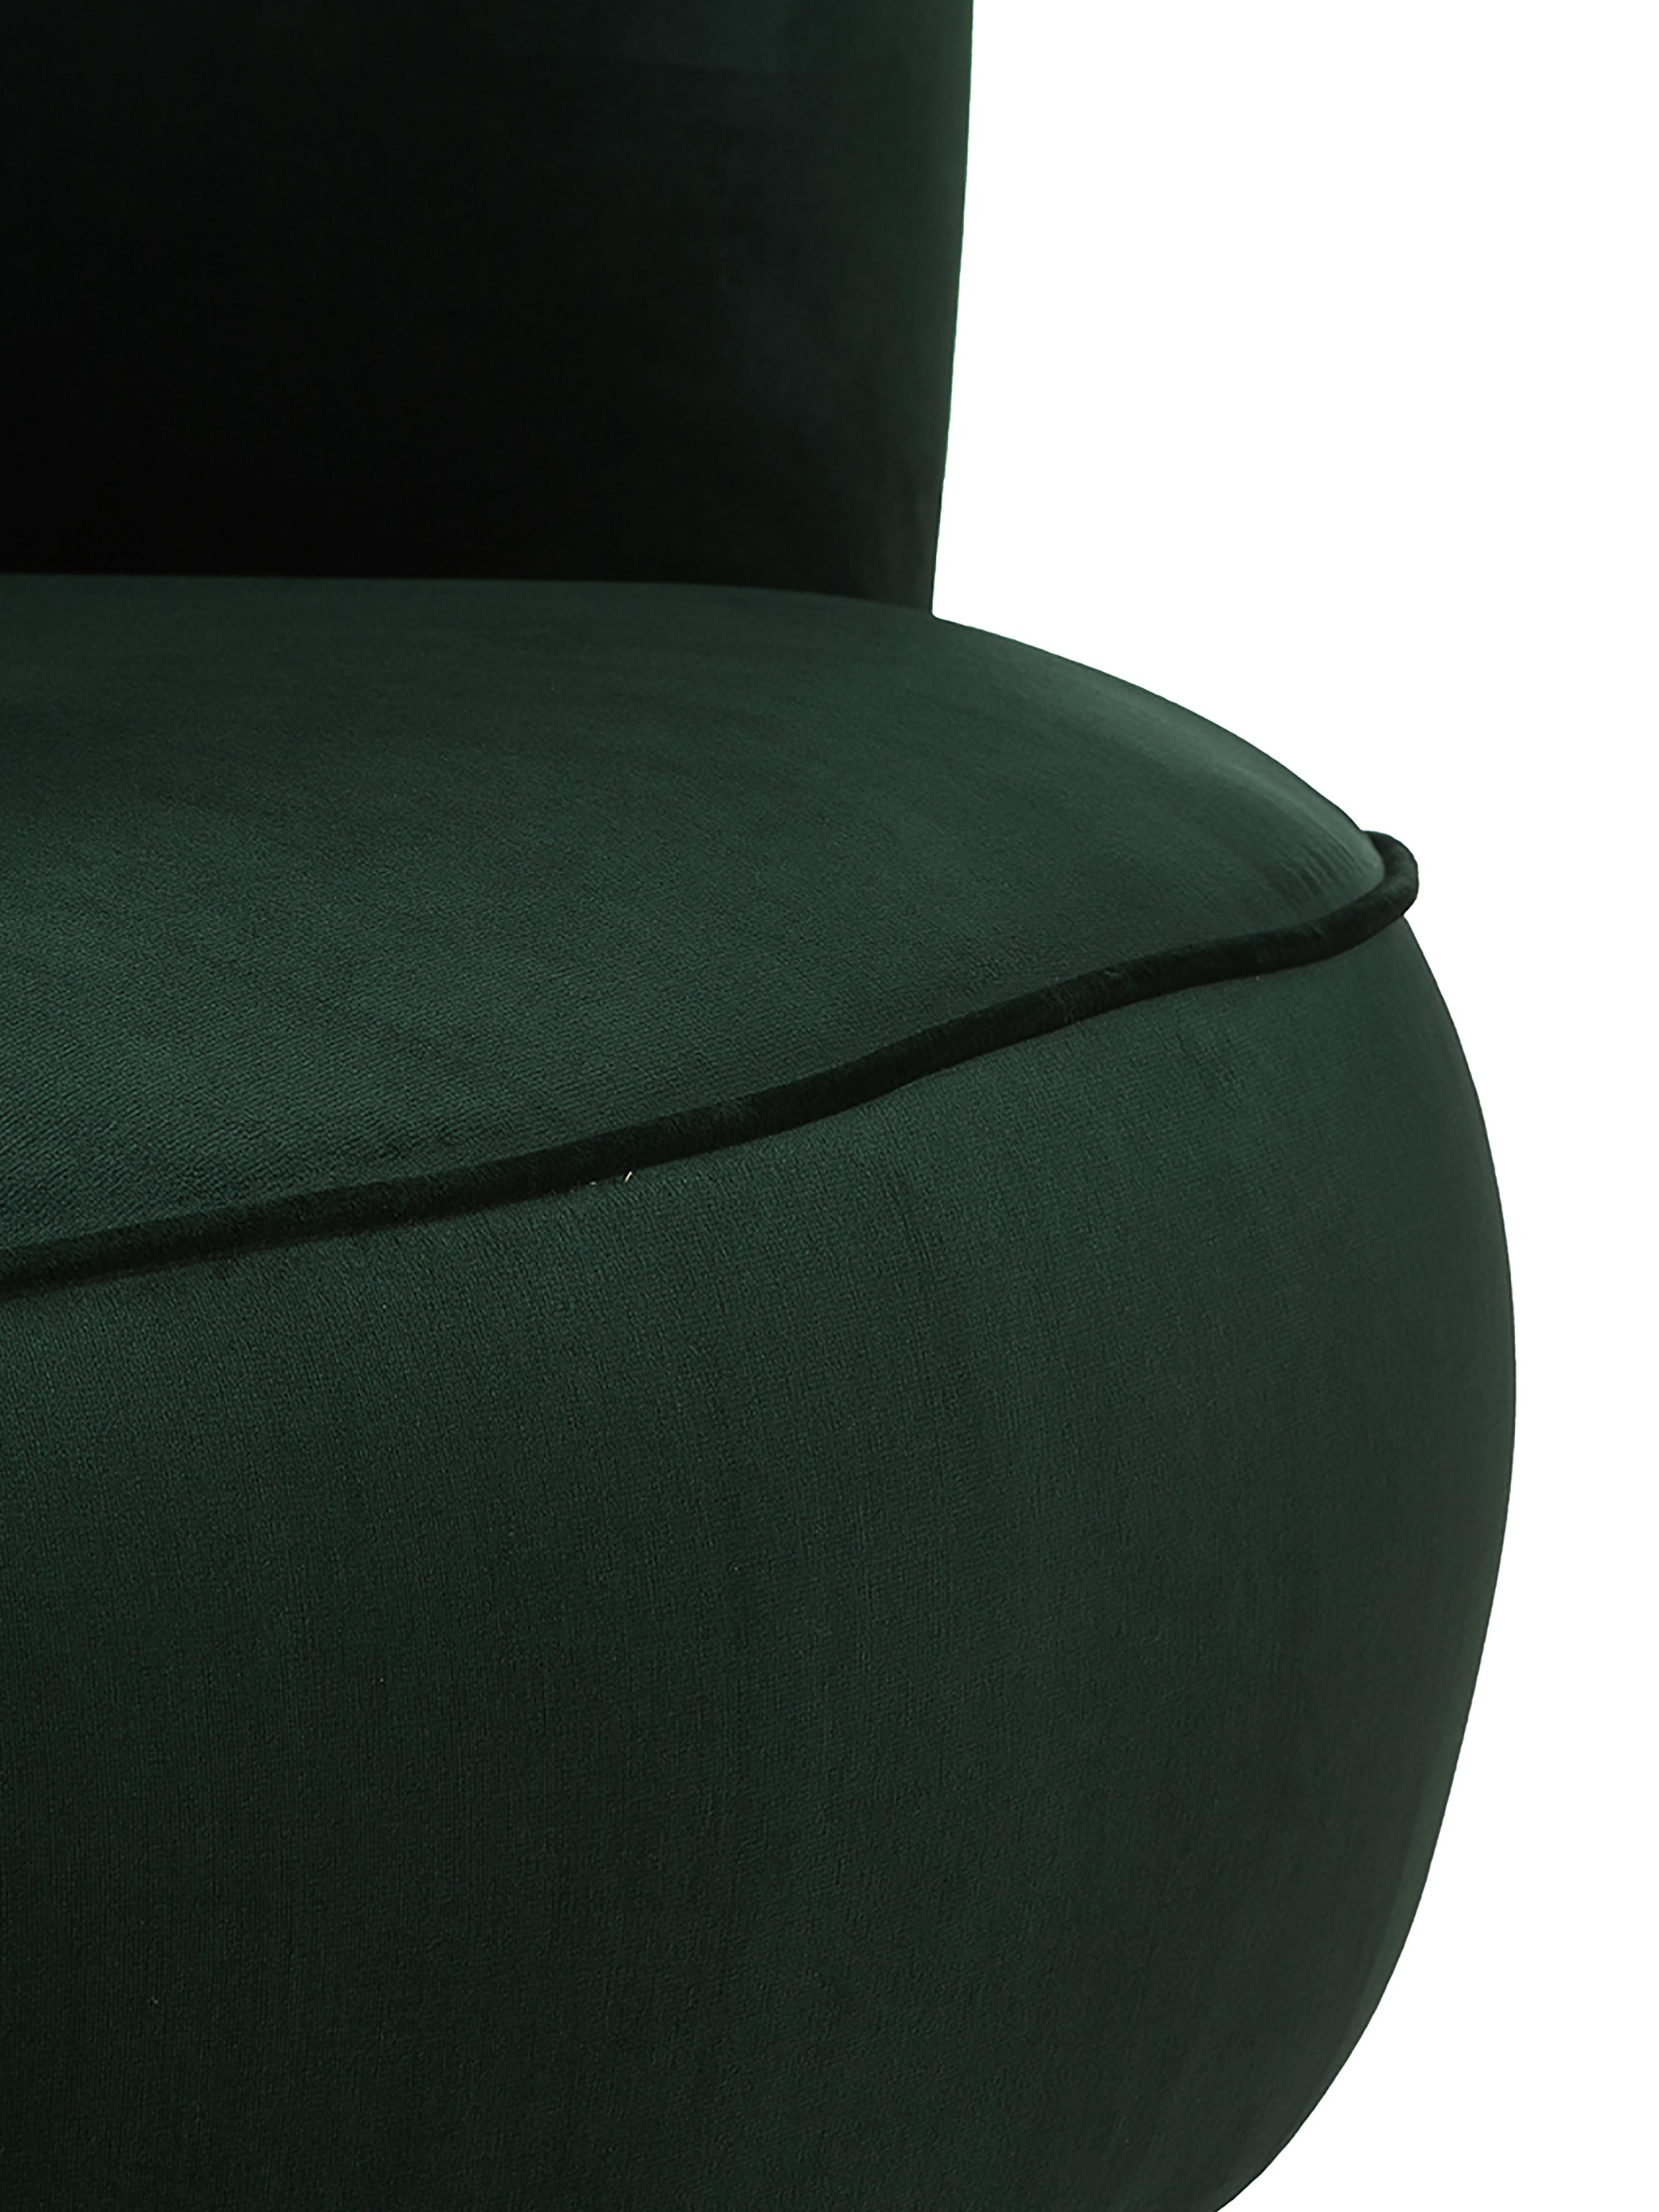 Samt-Cocktailsessel Ella in Grün, Bezug: Samt (Polyester) 50.000 S, Füße: Metall, lackiert, Samt Dunkelgrün, B 74 x T 78 cm